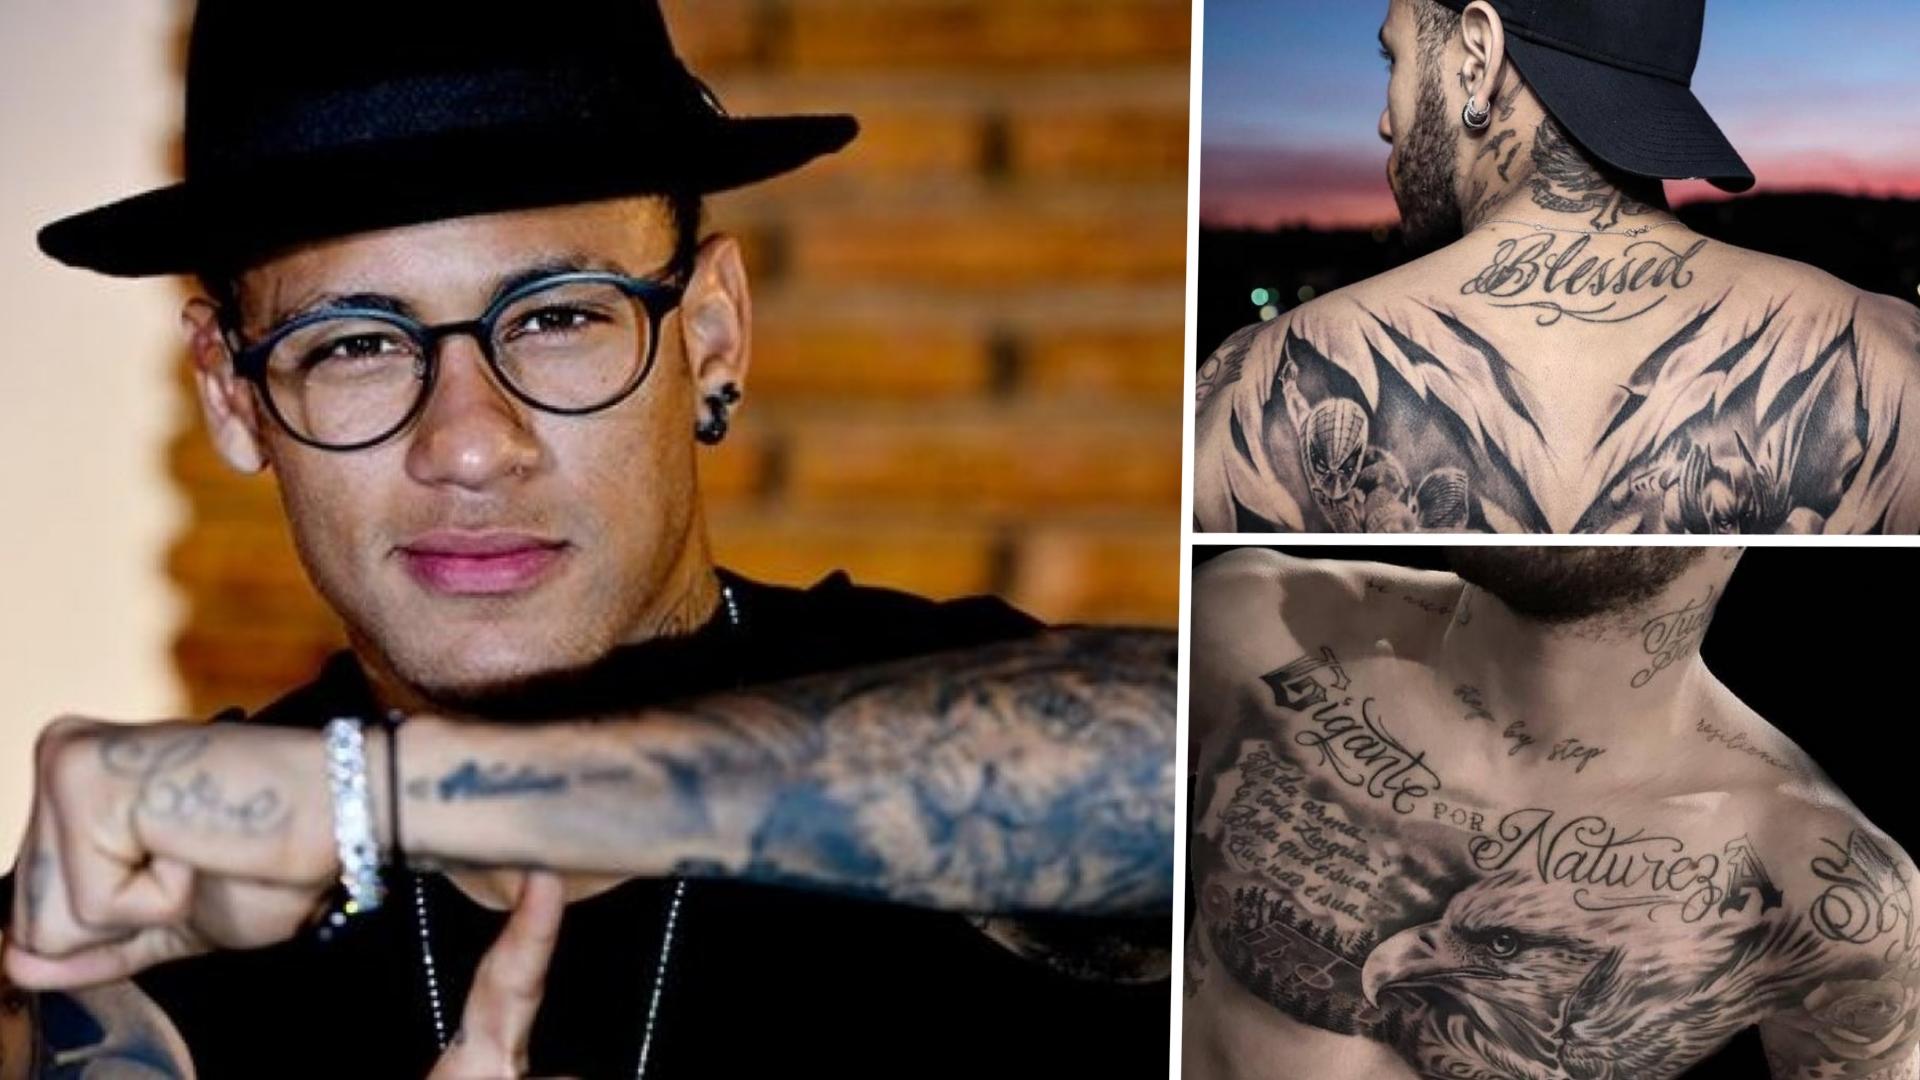 Estilo: ¿tatuajes o piercings?